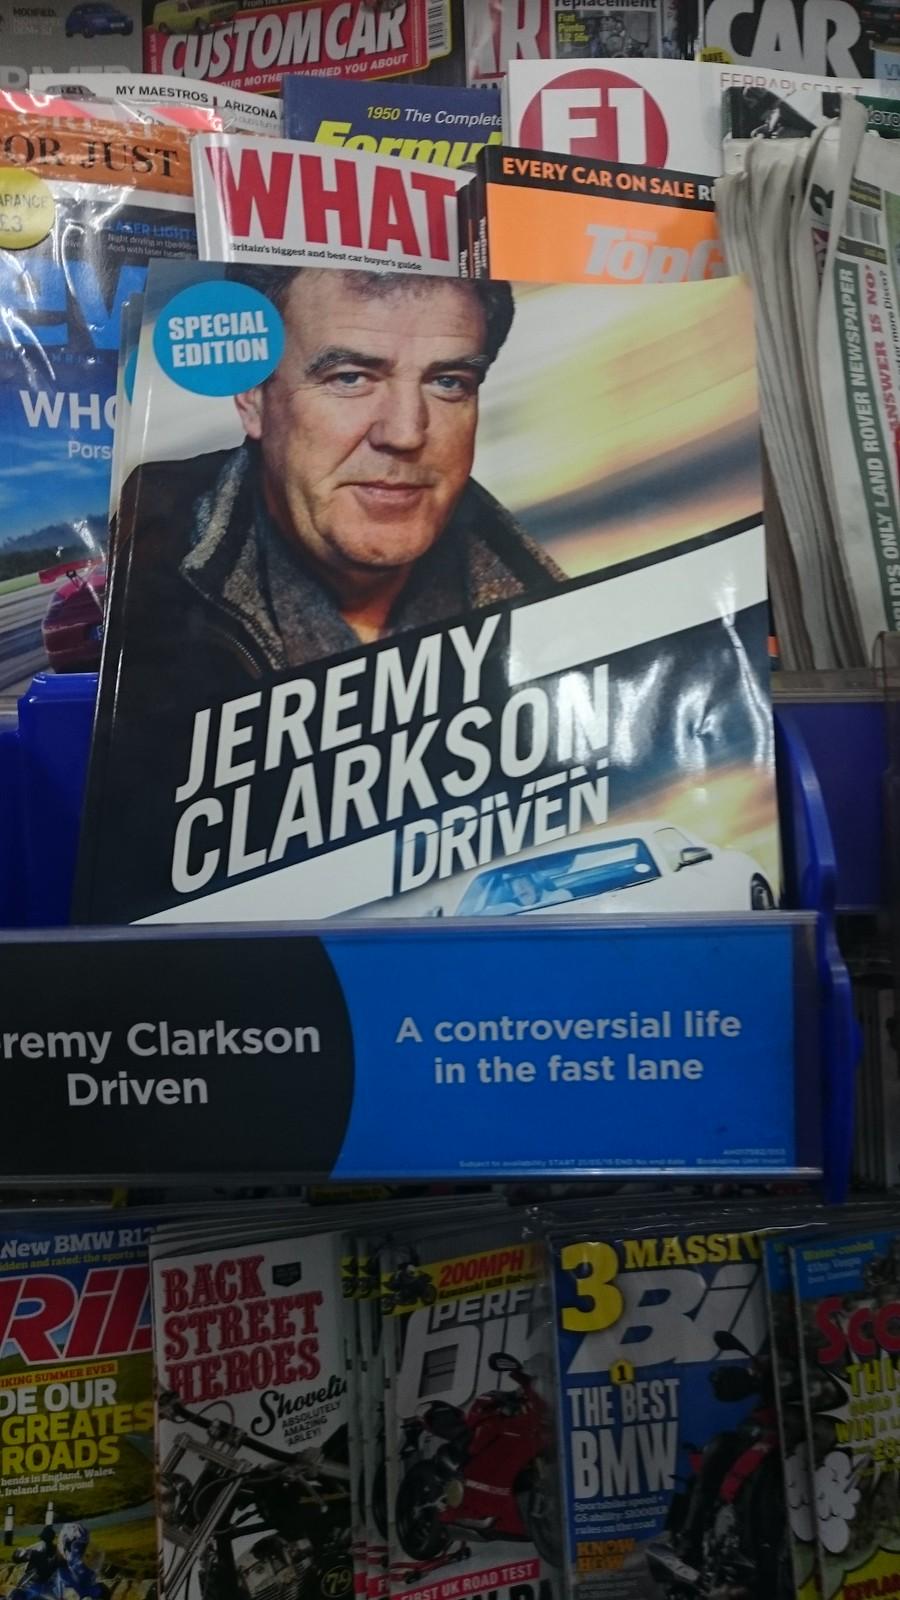 Jeremy Clarkson - Driven